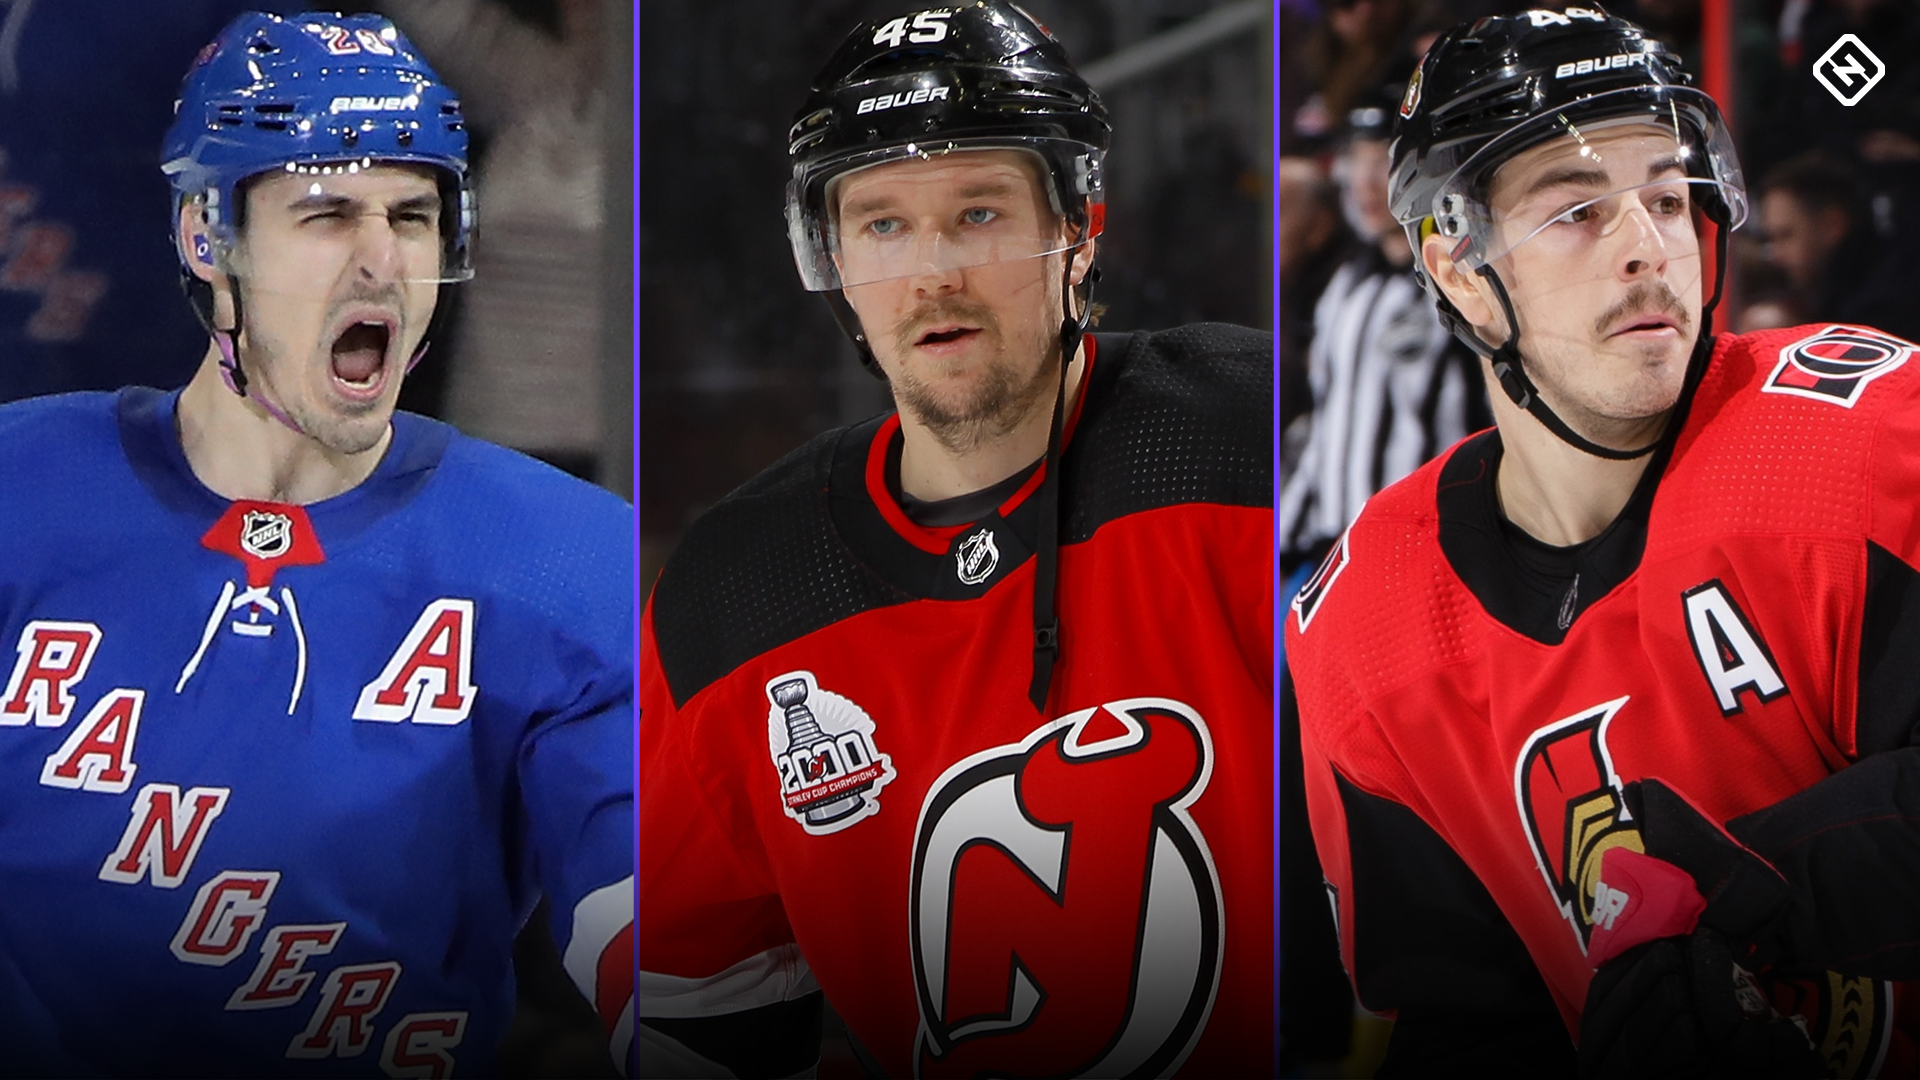 NHL trade deadline 2020: Latest rumors involving top trade bait ahead of deadline day